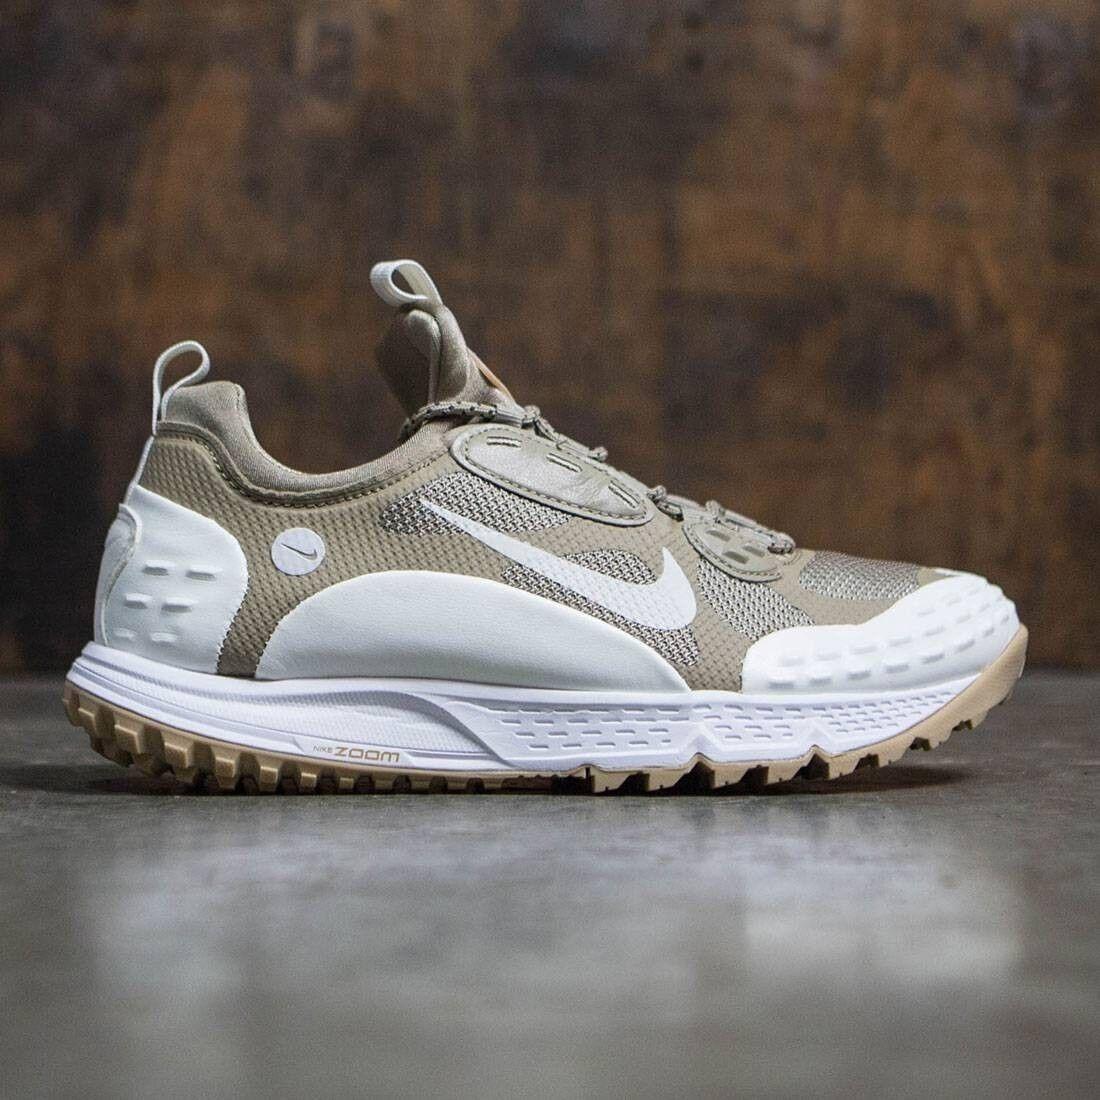 Nike Air Zoom Albis 16 - 904334-200 Herren Kinder Sneaker Weiß Neu Schuhe Gr.36